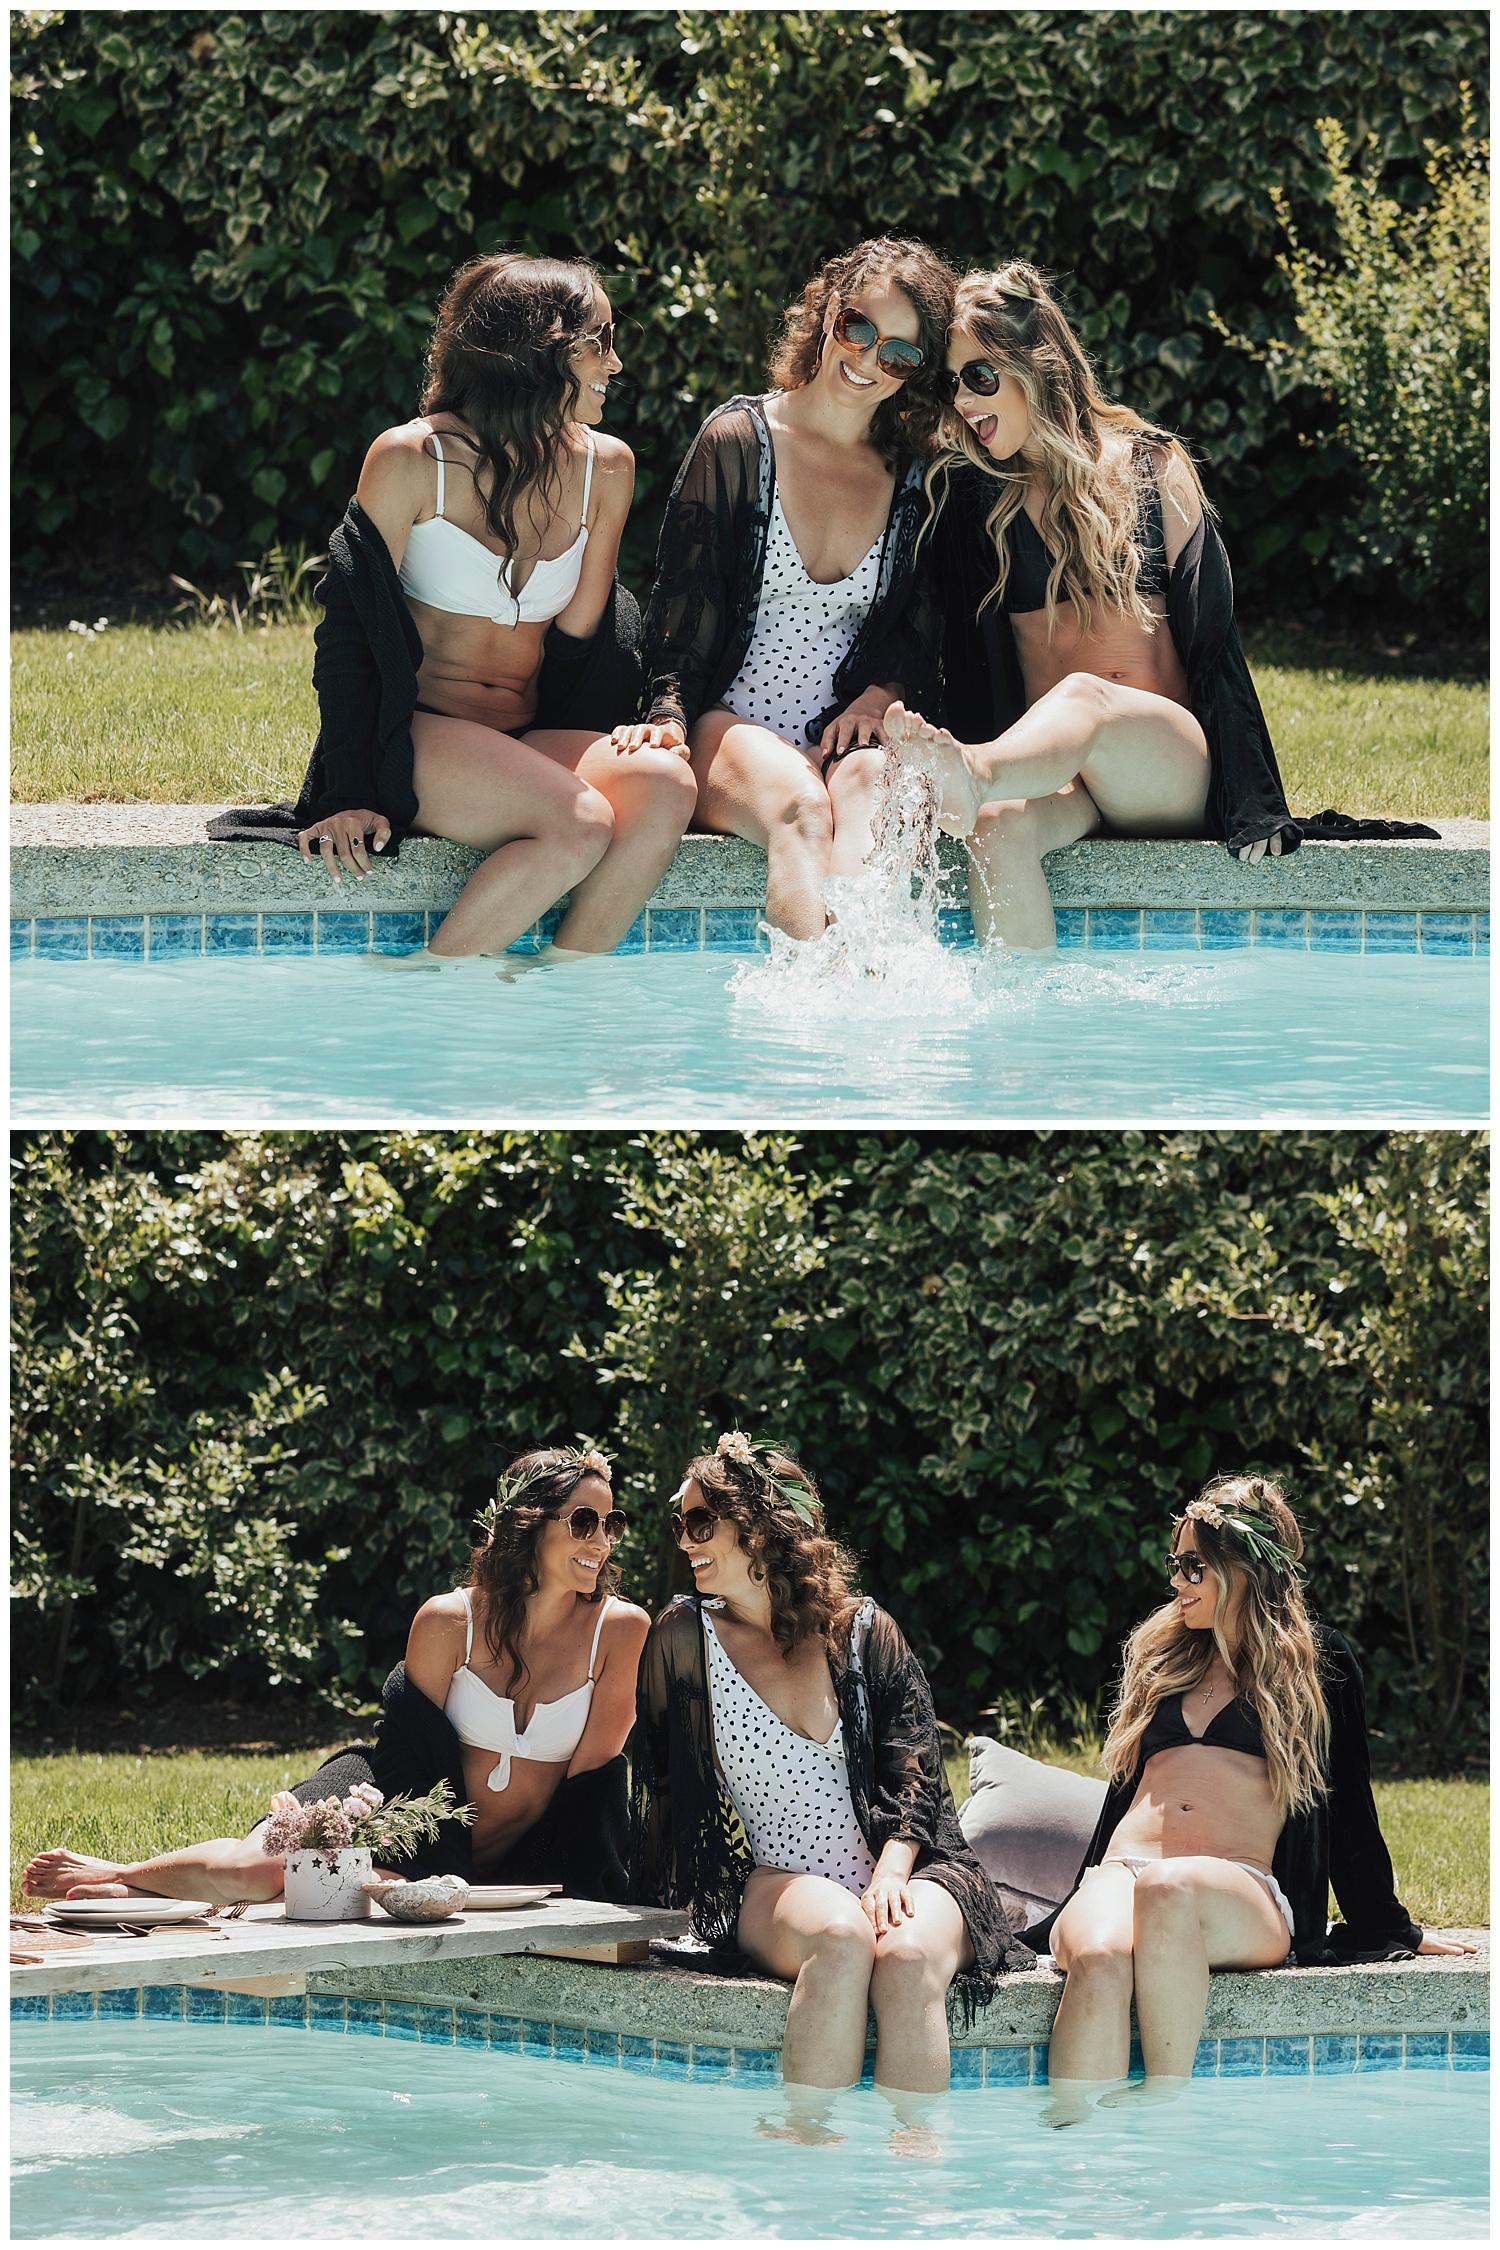 bachelorette-pool-party-carmel-valley-california.jpg